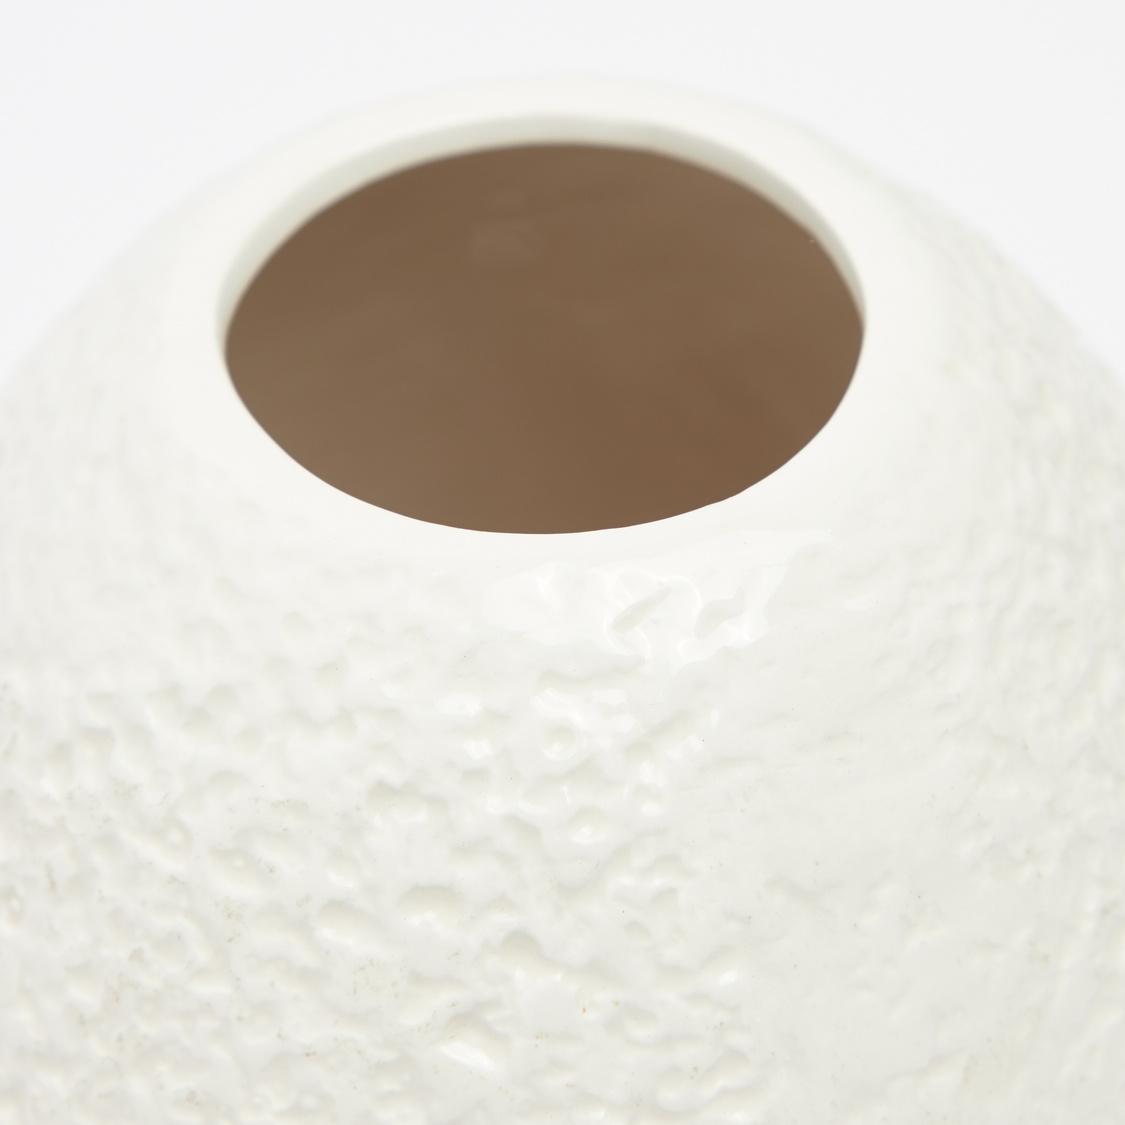 Decorative Vase - 186.2x16.2x19.5 cms